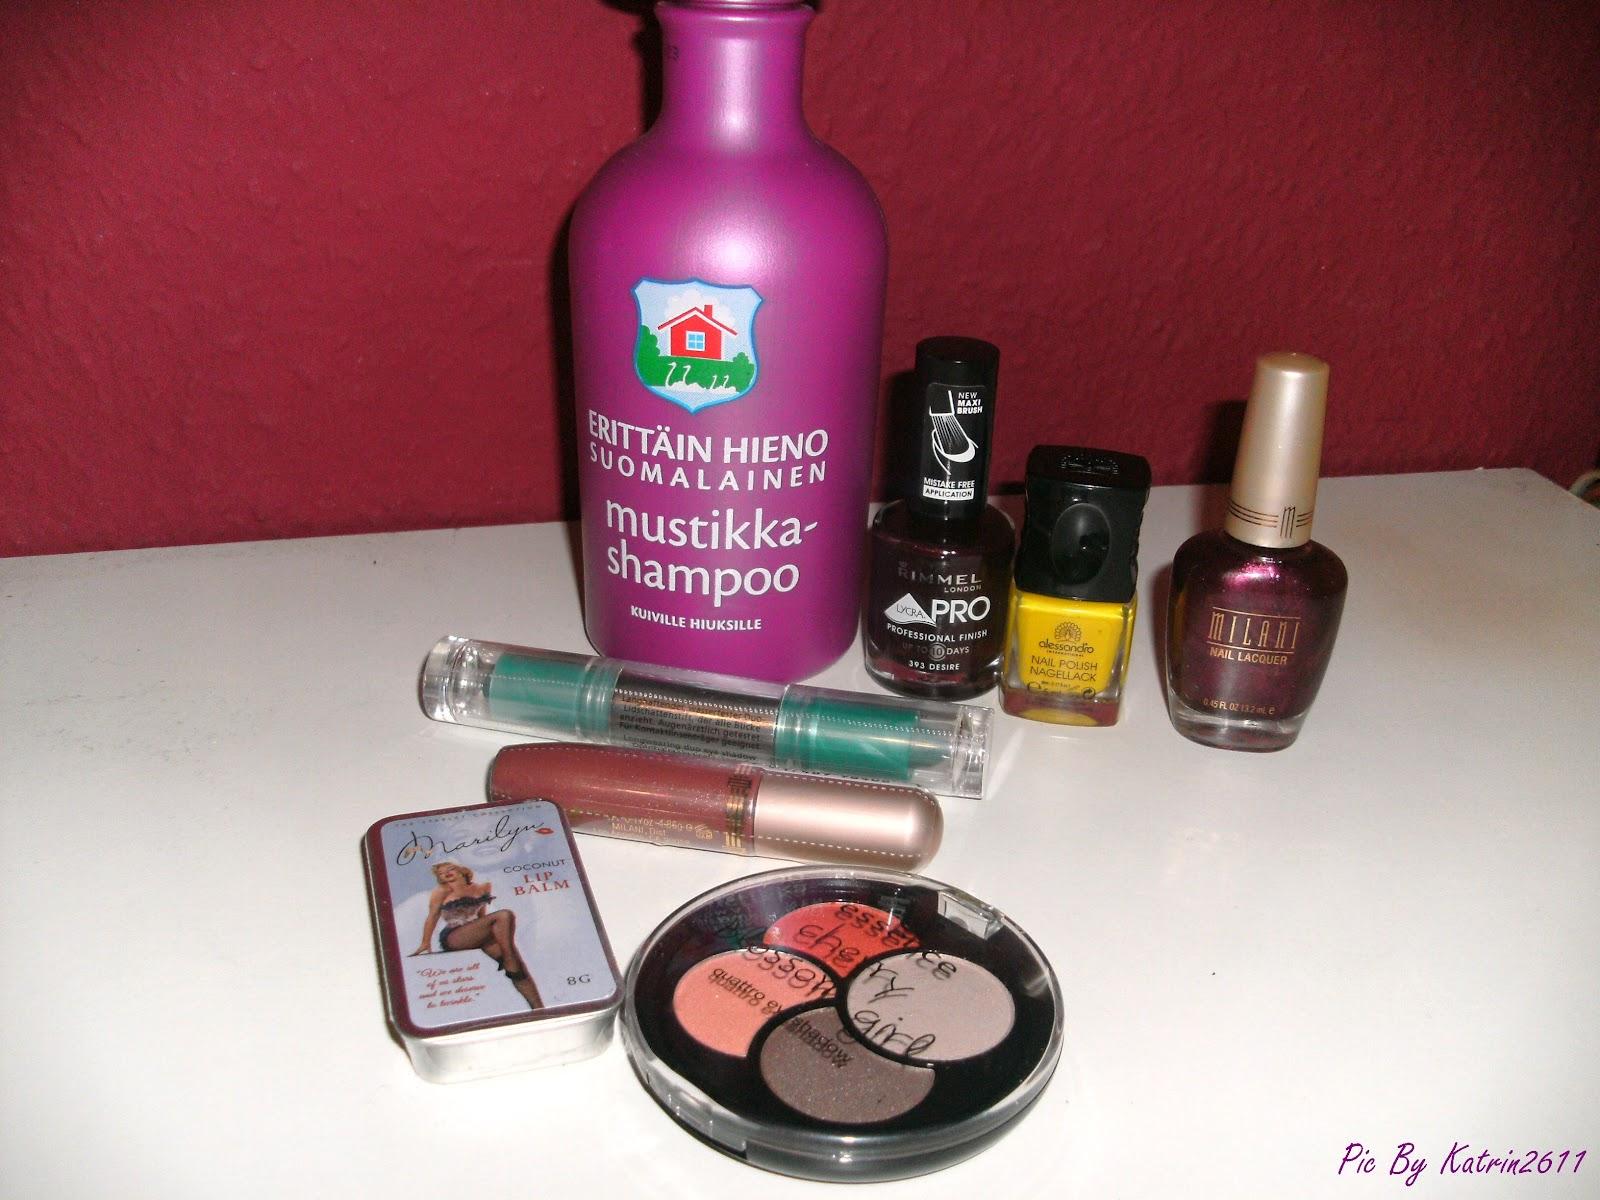 http://3.bp.blogspot.com/-lOV2jNnqWYU/UGWr0y5nt2I/AAAAAAAACho/z6PQ64XDv6I/s1600/PICT2183.jpg